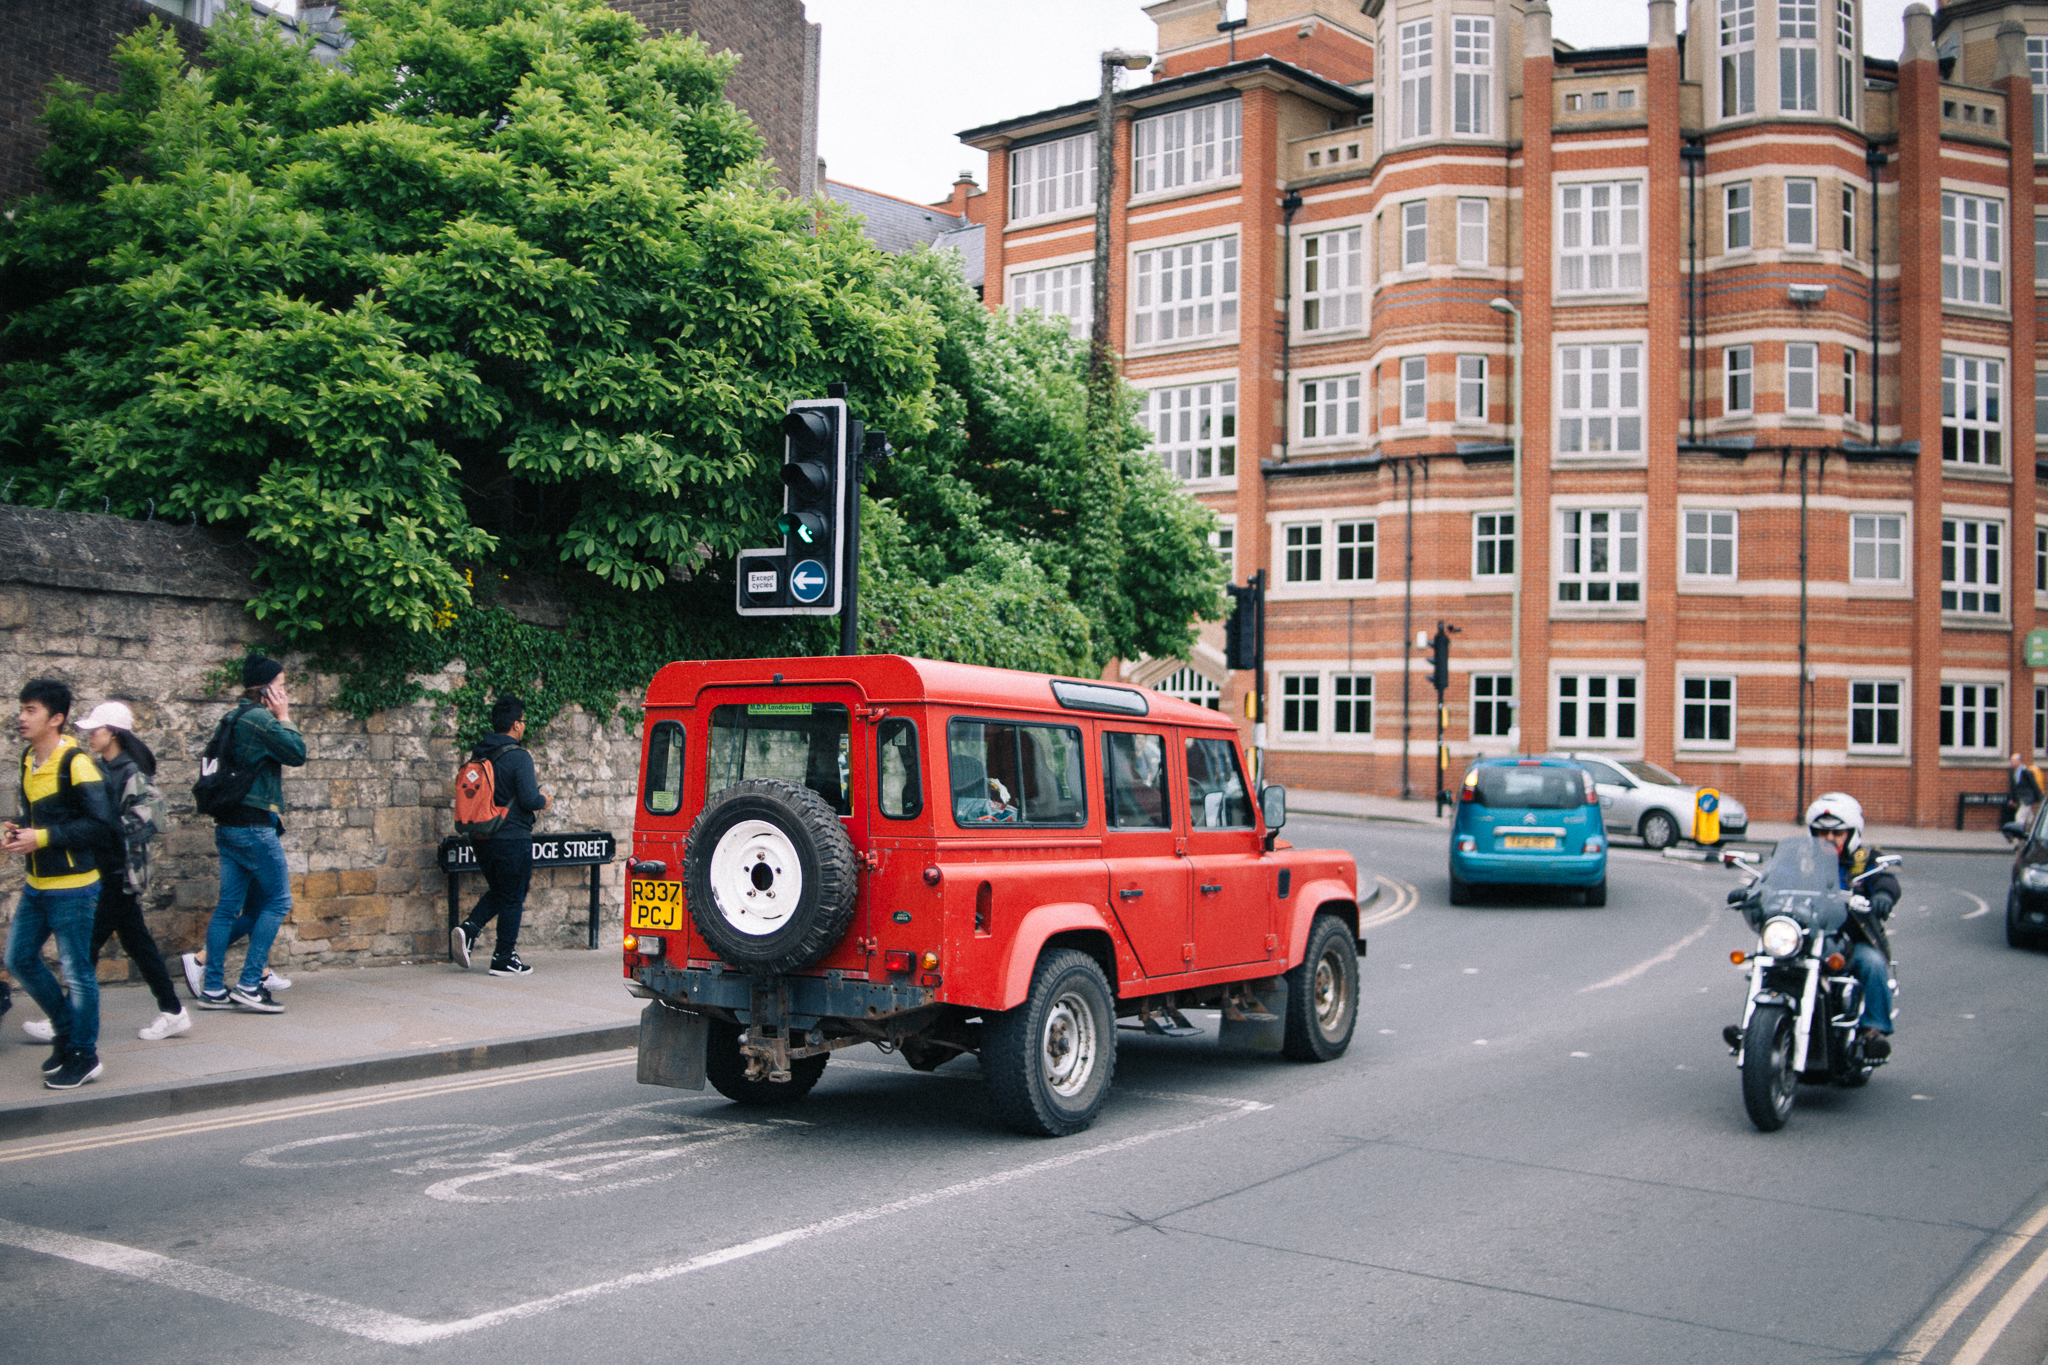 Oxford_0014.jpg